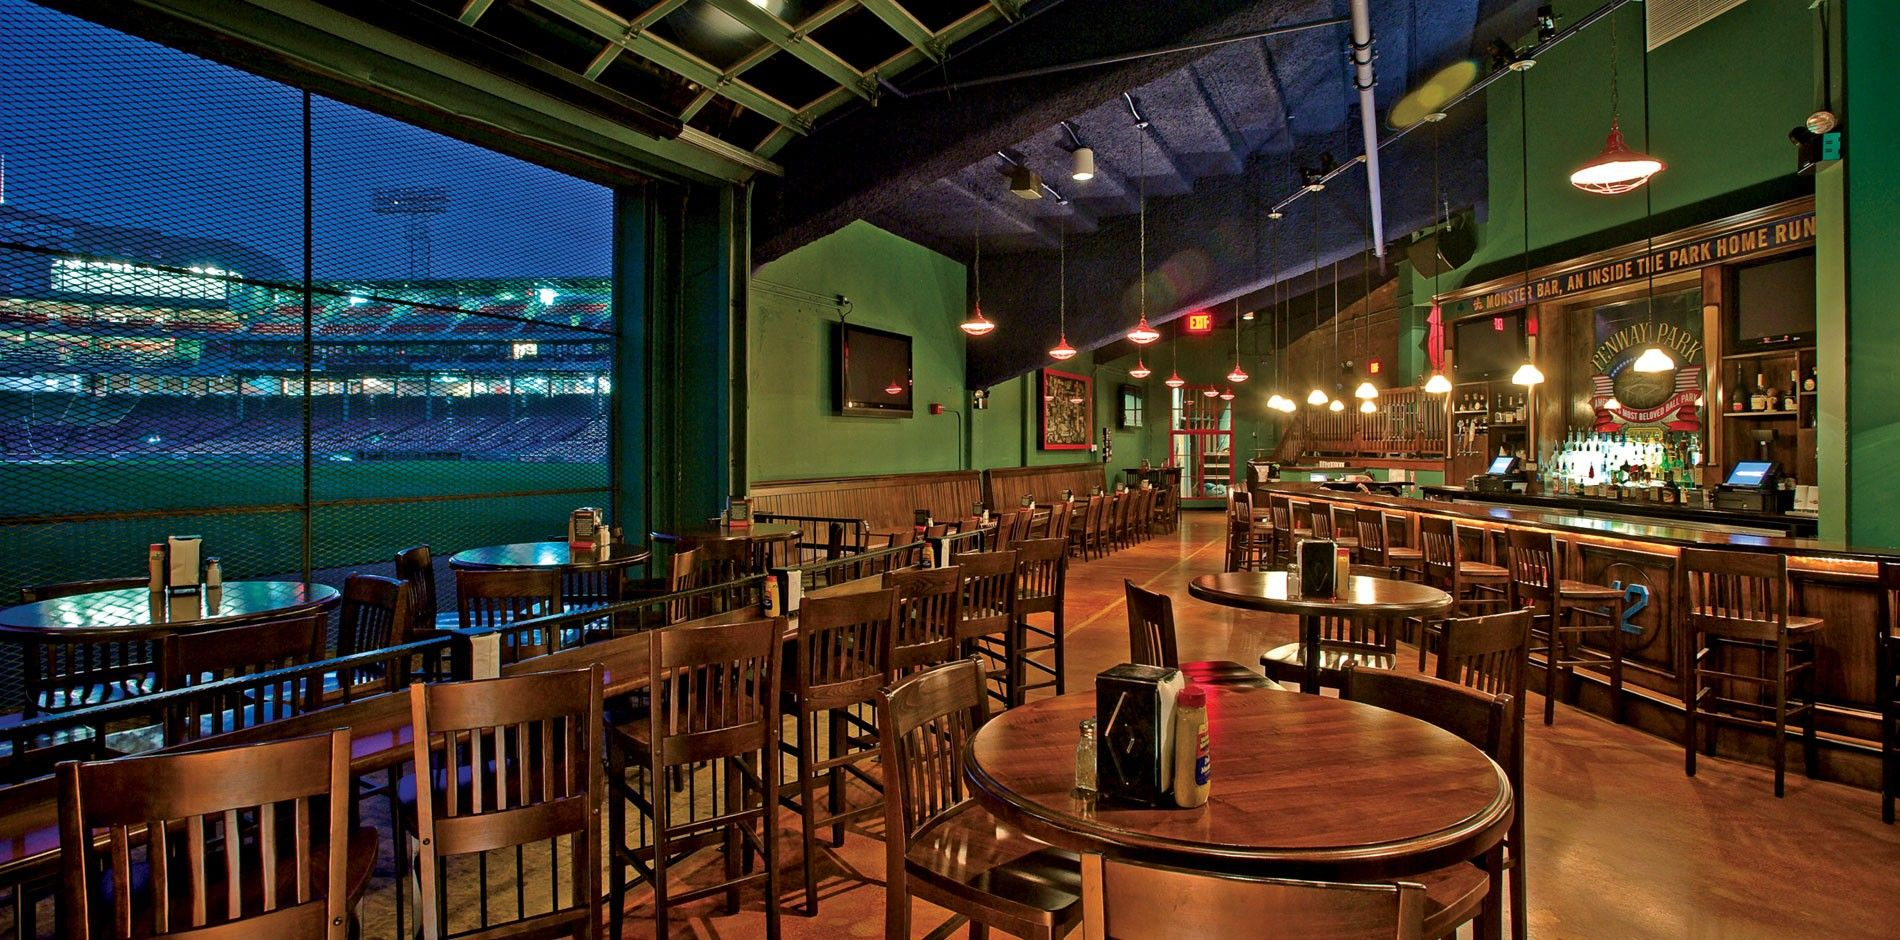 Red Sox At Bleacher Bar Bleachers Bar Boston Massachusetts Restaurants Cool Bars